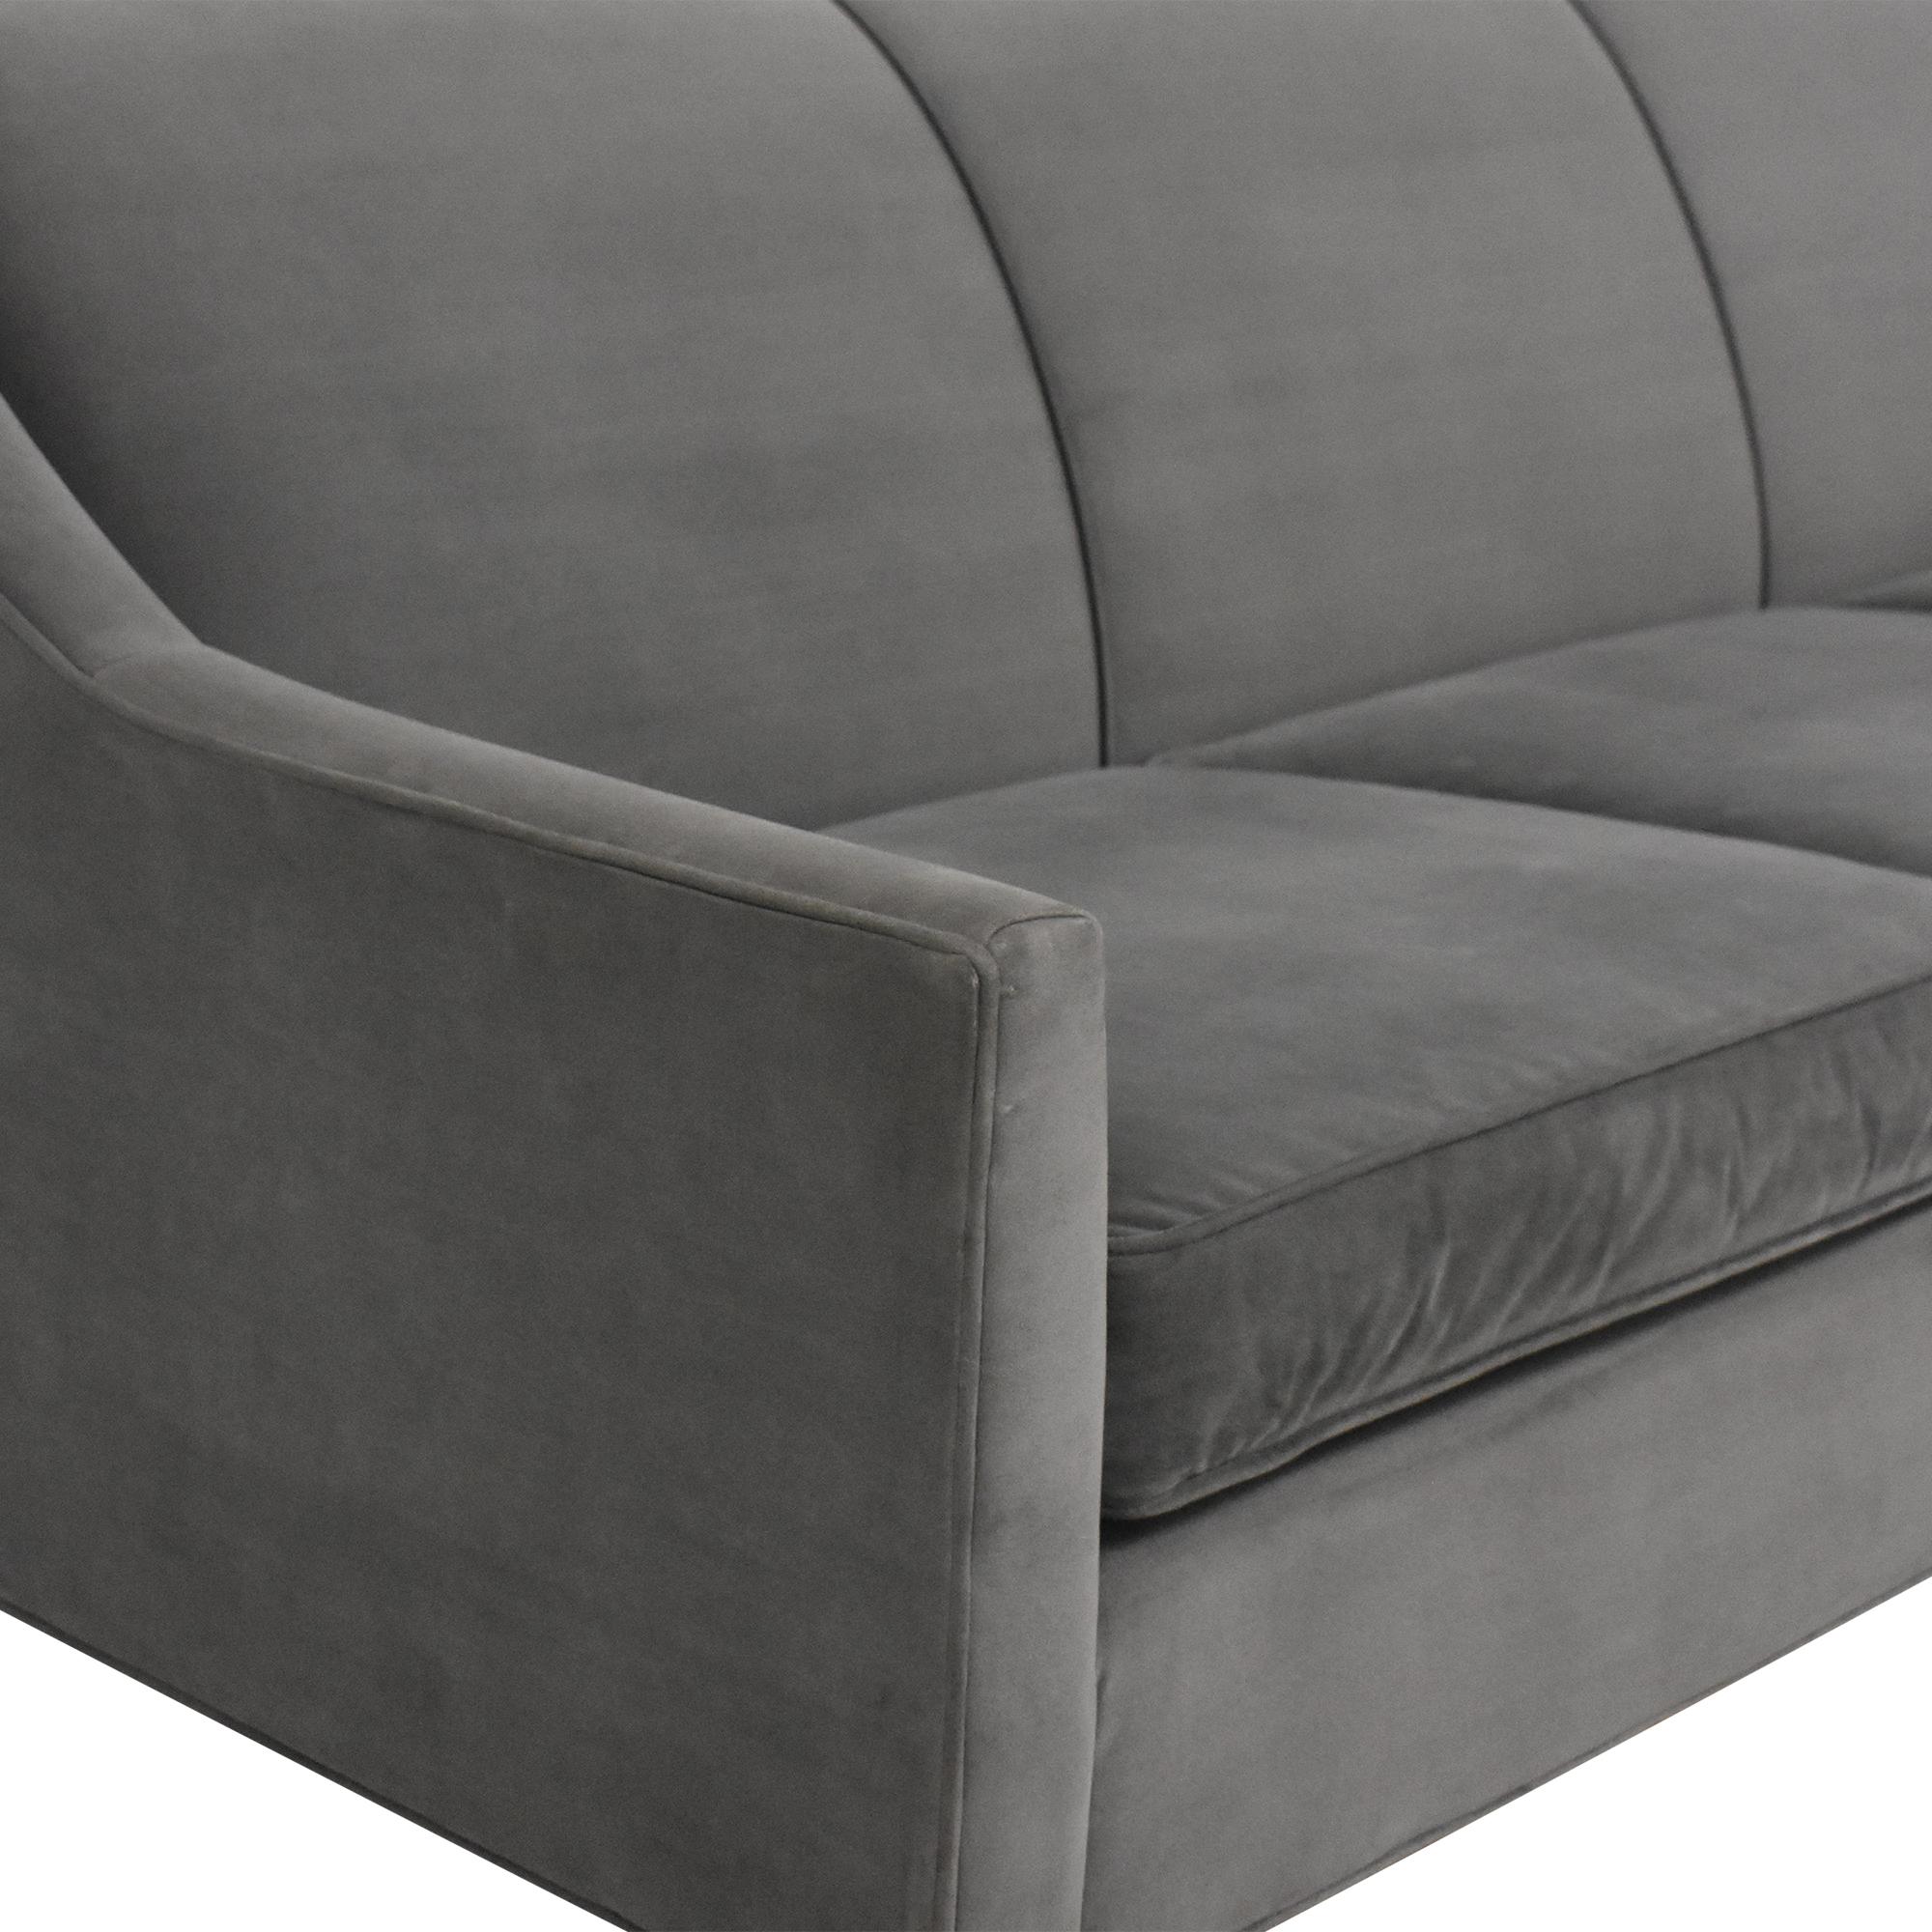 Mitchell Gold + Bob Williams Mitchell Gold + Bob Williams Cara Three Cushion Sofa on sale